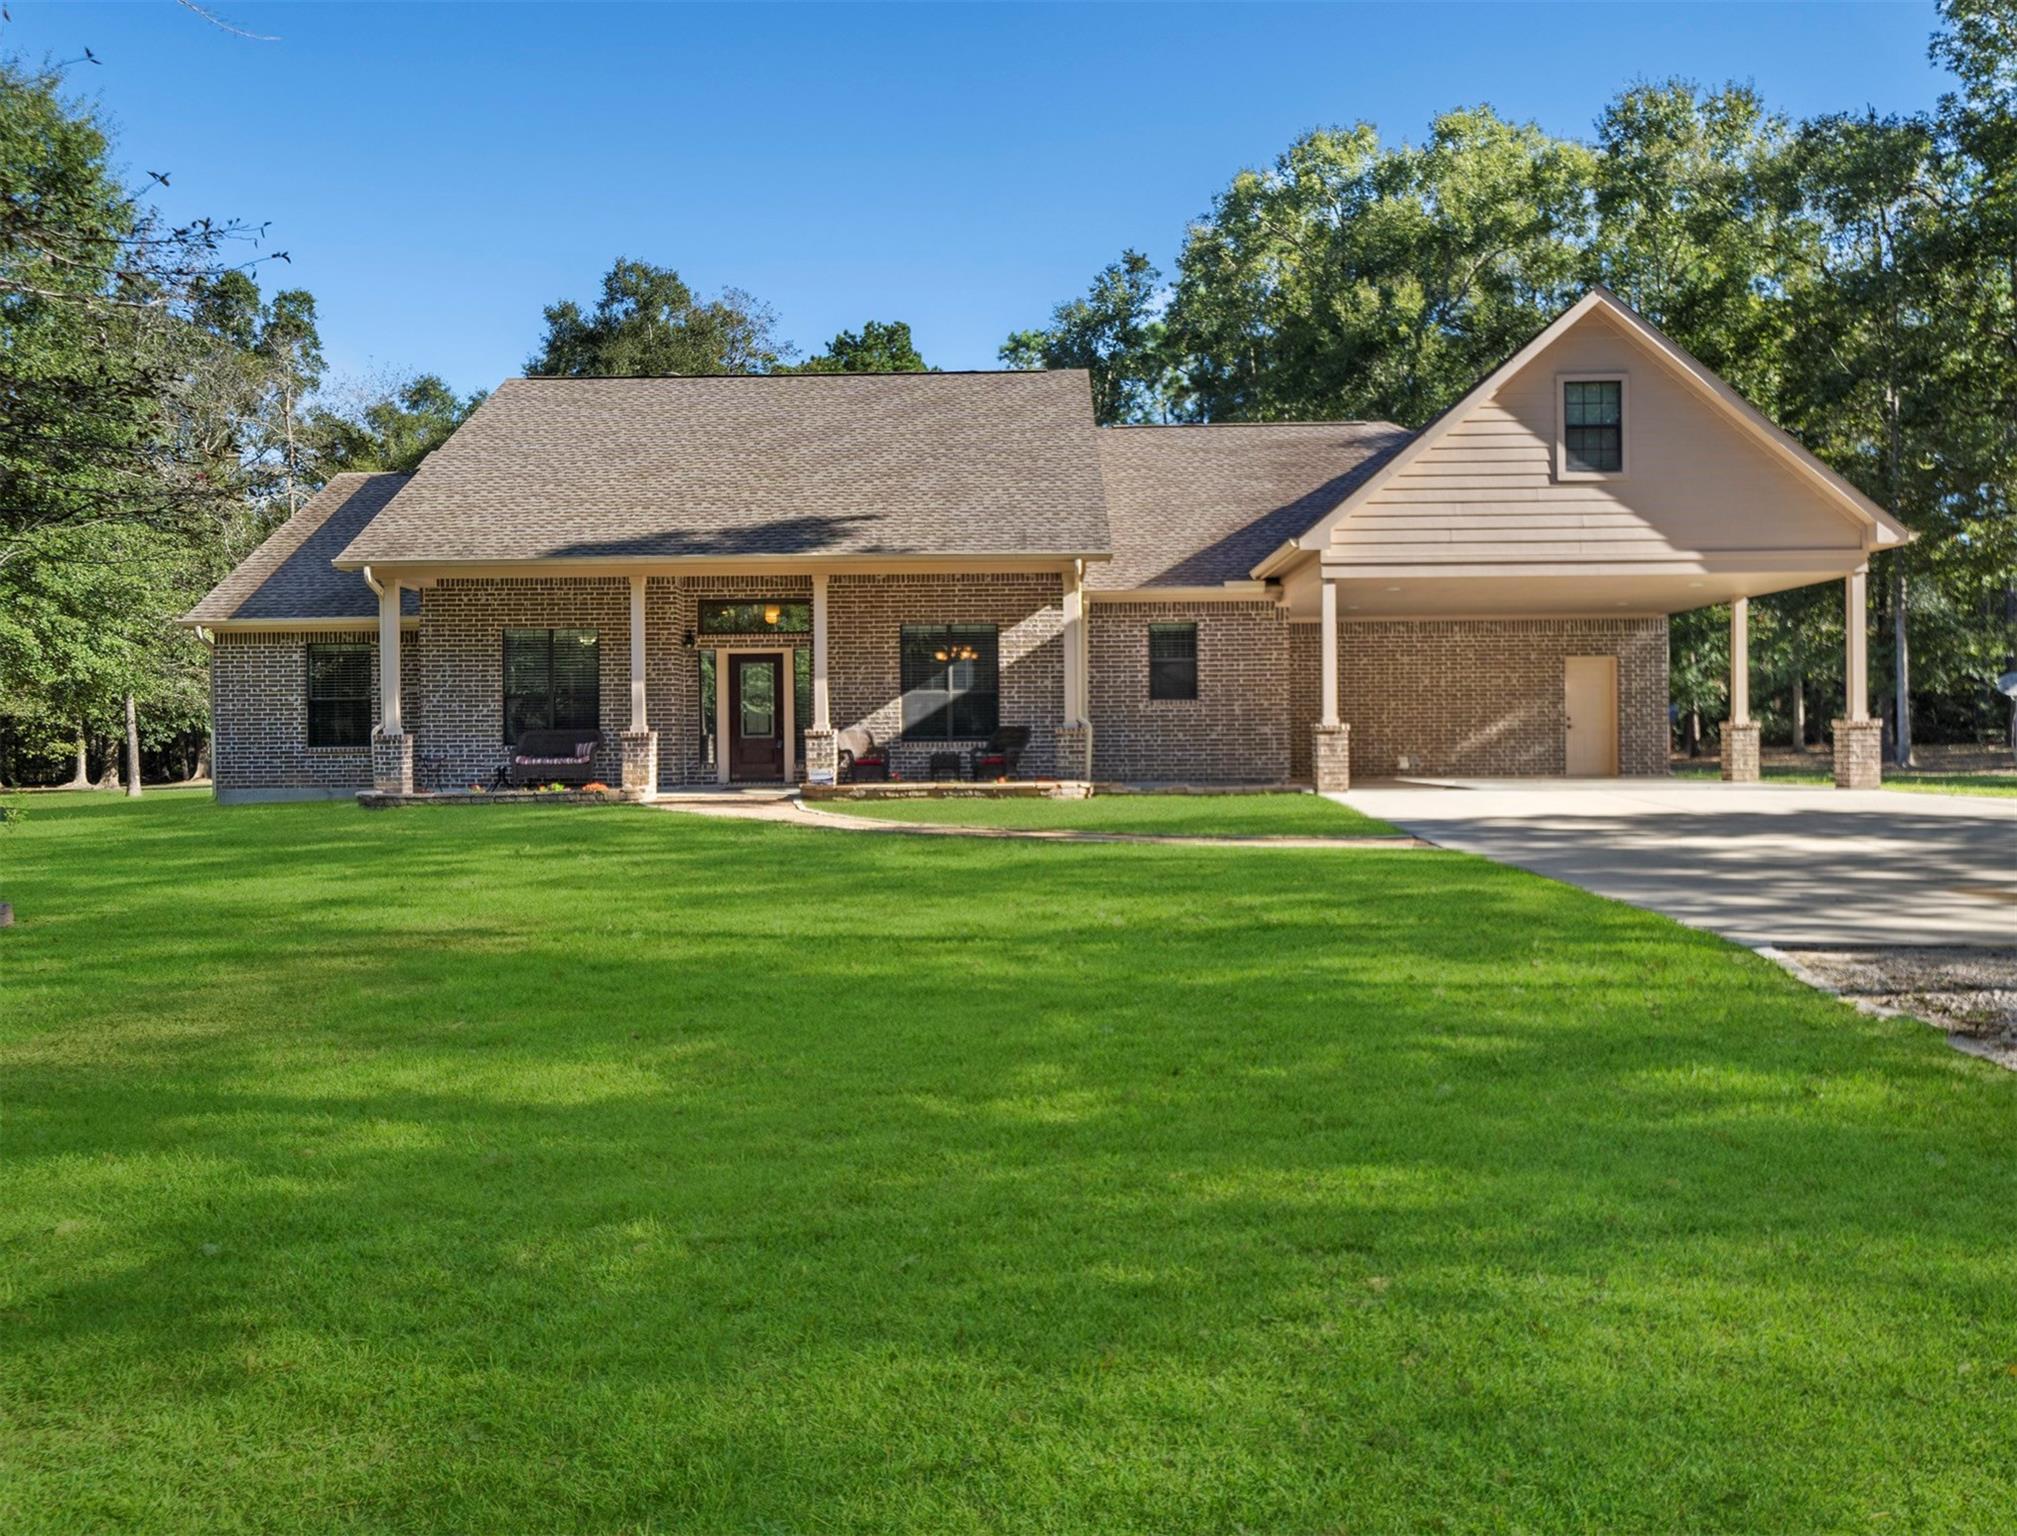 10155 Pineridge Property Photo - Conroe, TX real estate listing